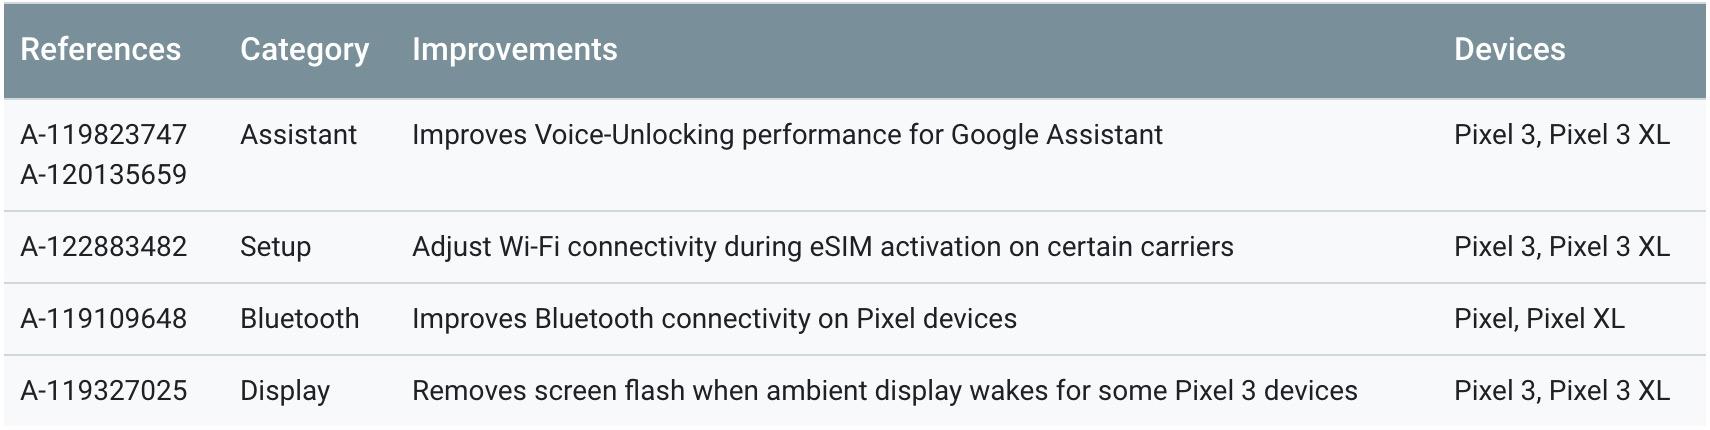 April 18 Pixel functional updates